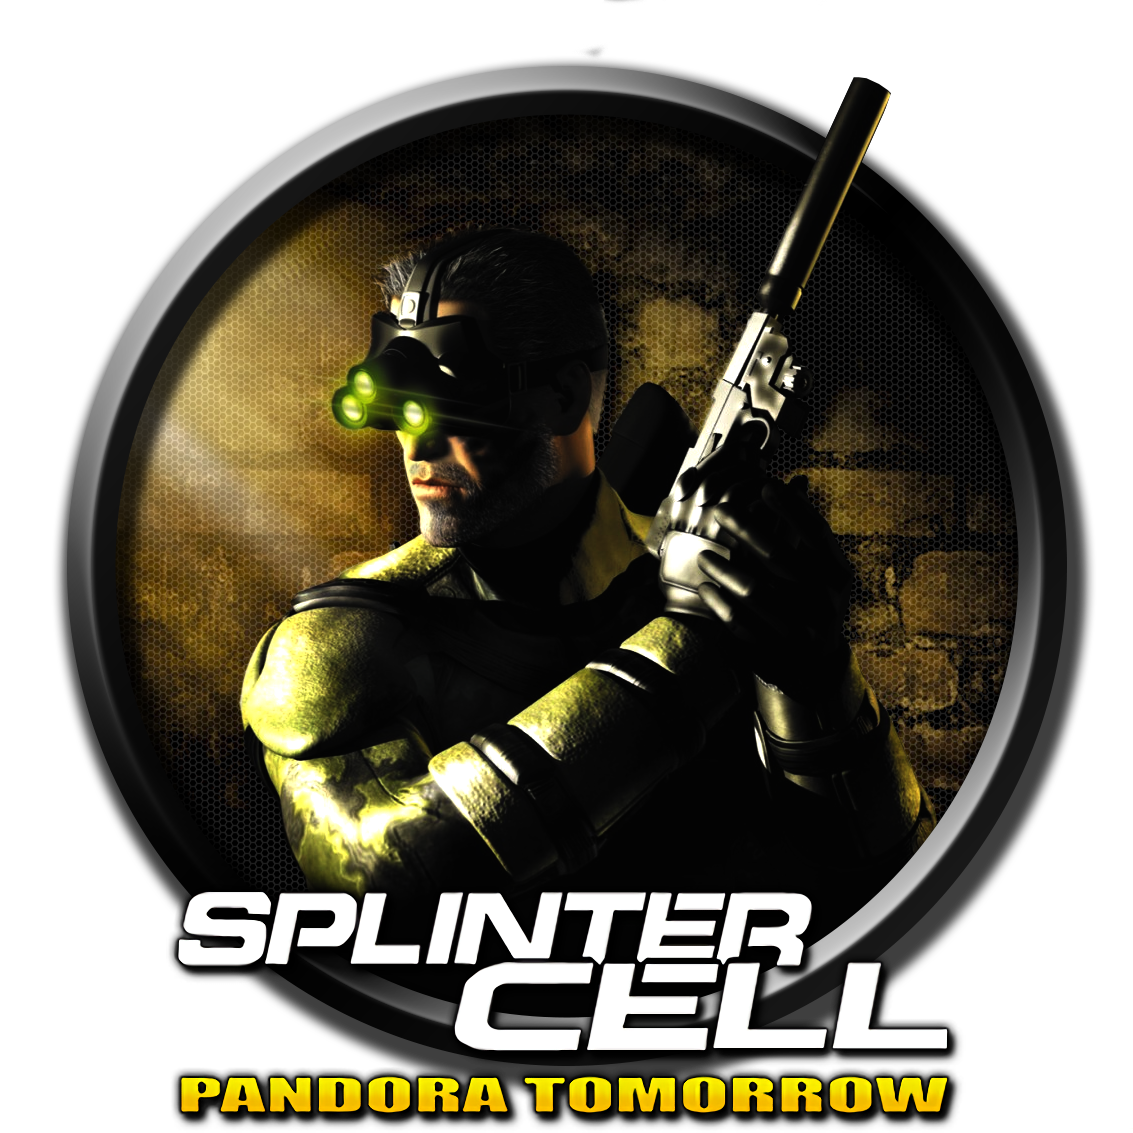 SplinterCell_PandoraTomorrow